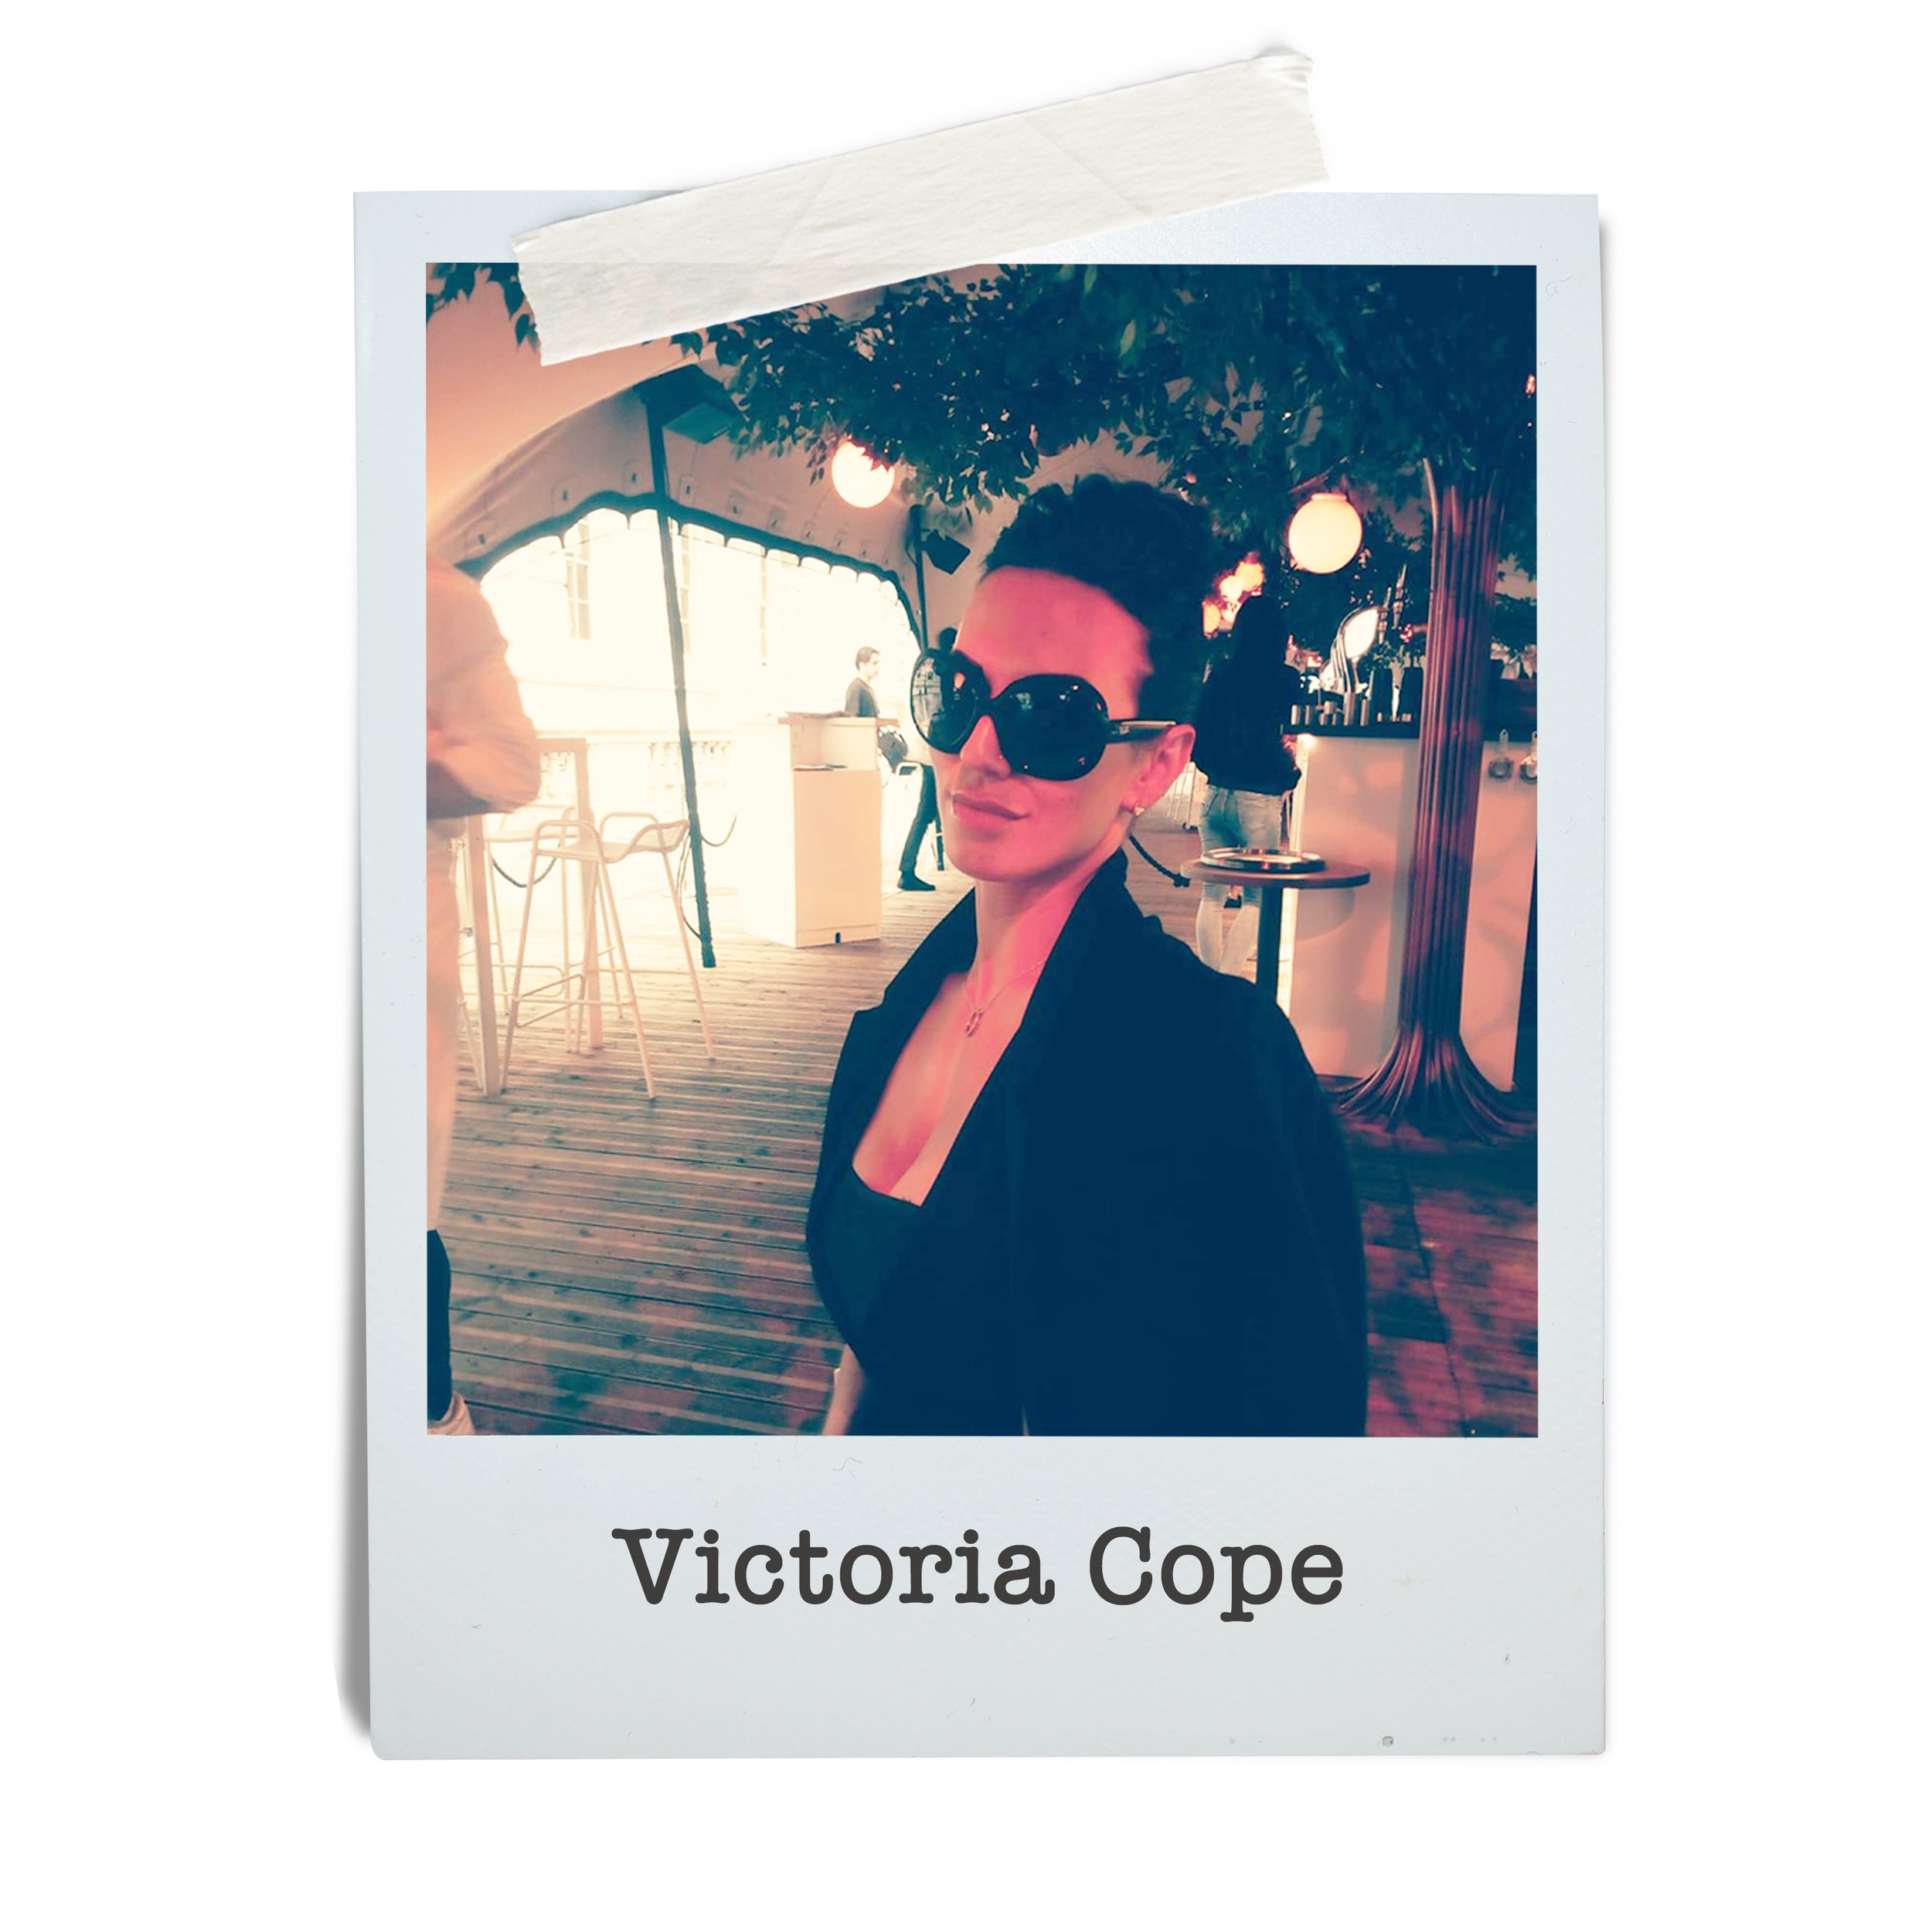 Victoria Cope